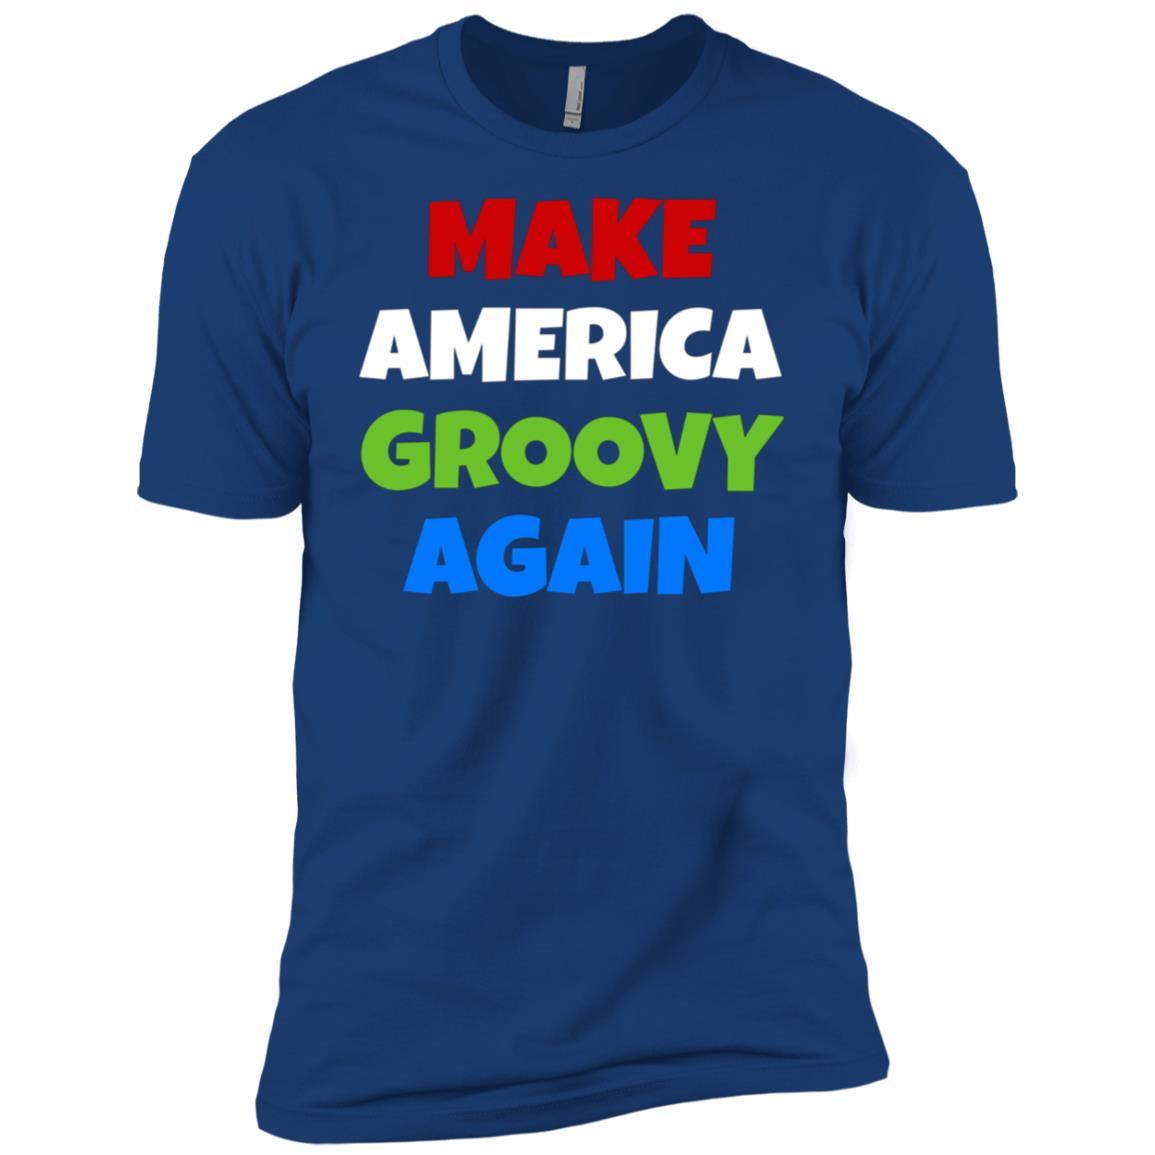 Make America Groovy Again Retro Fun Whimsical Cool Men Short Sleeve T-Shirt